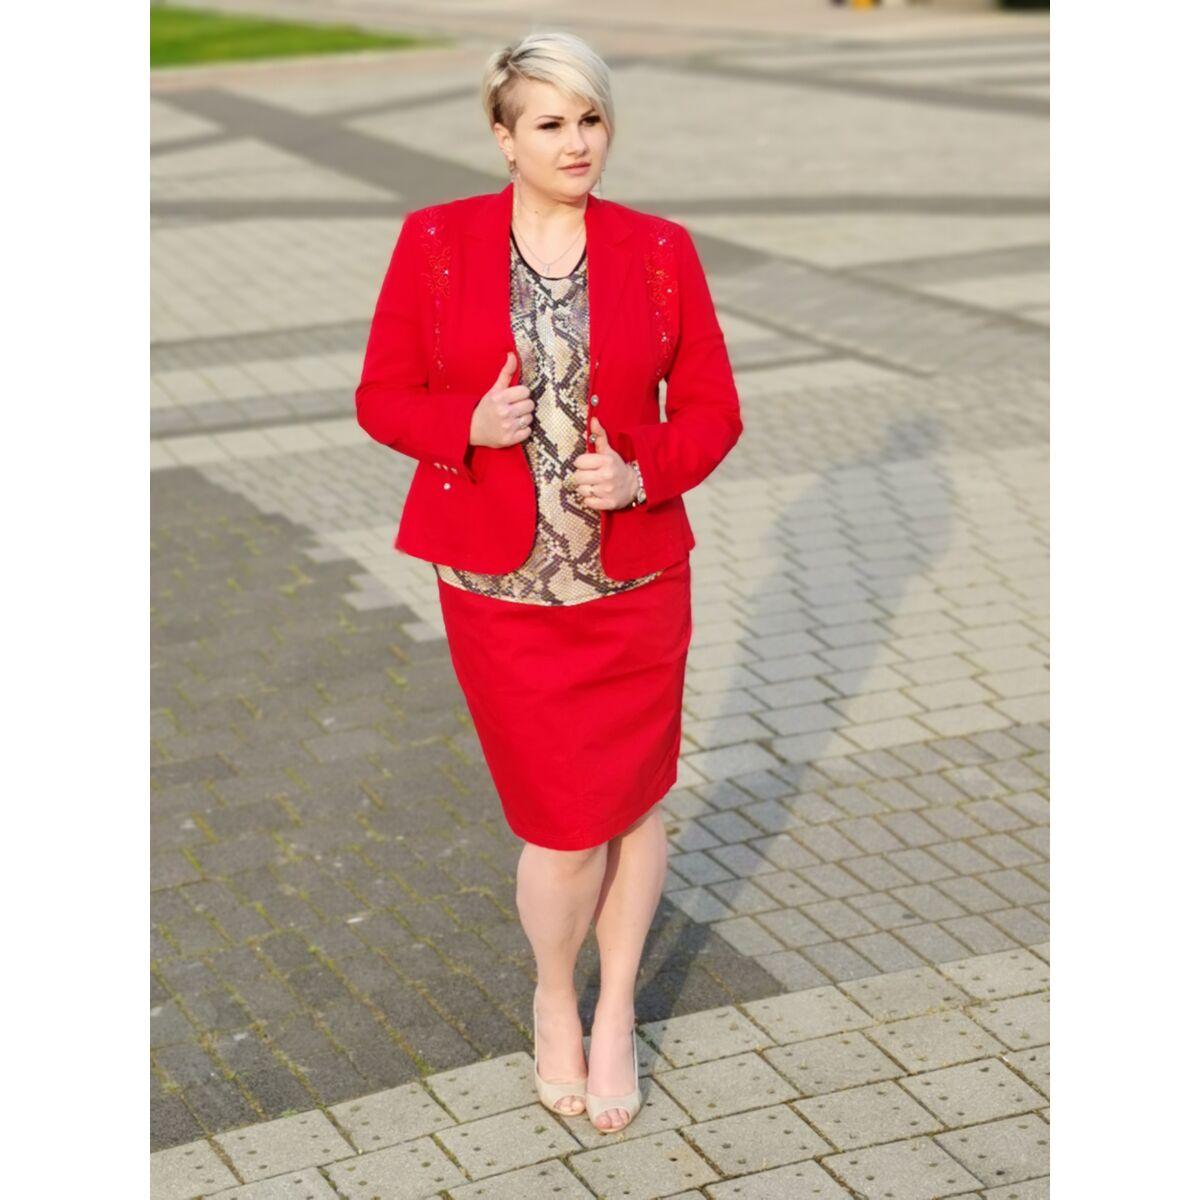 Rebecca szoknya - molett Lafei-Nier piros pamut szoknya